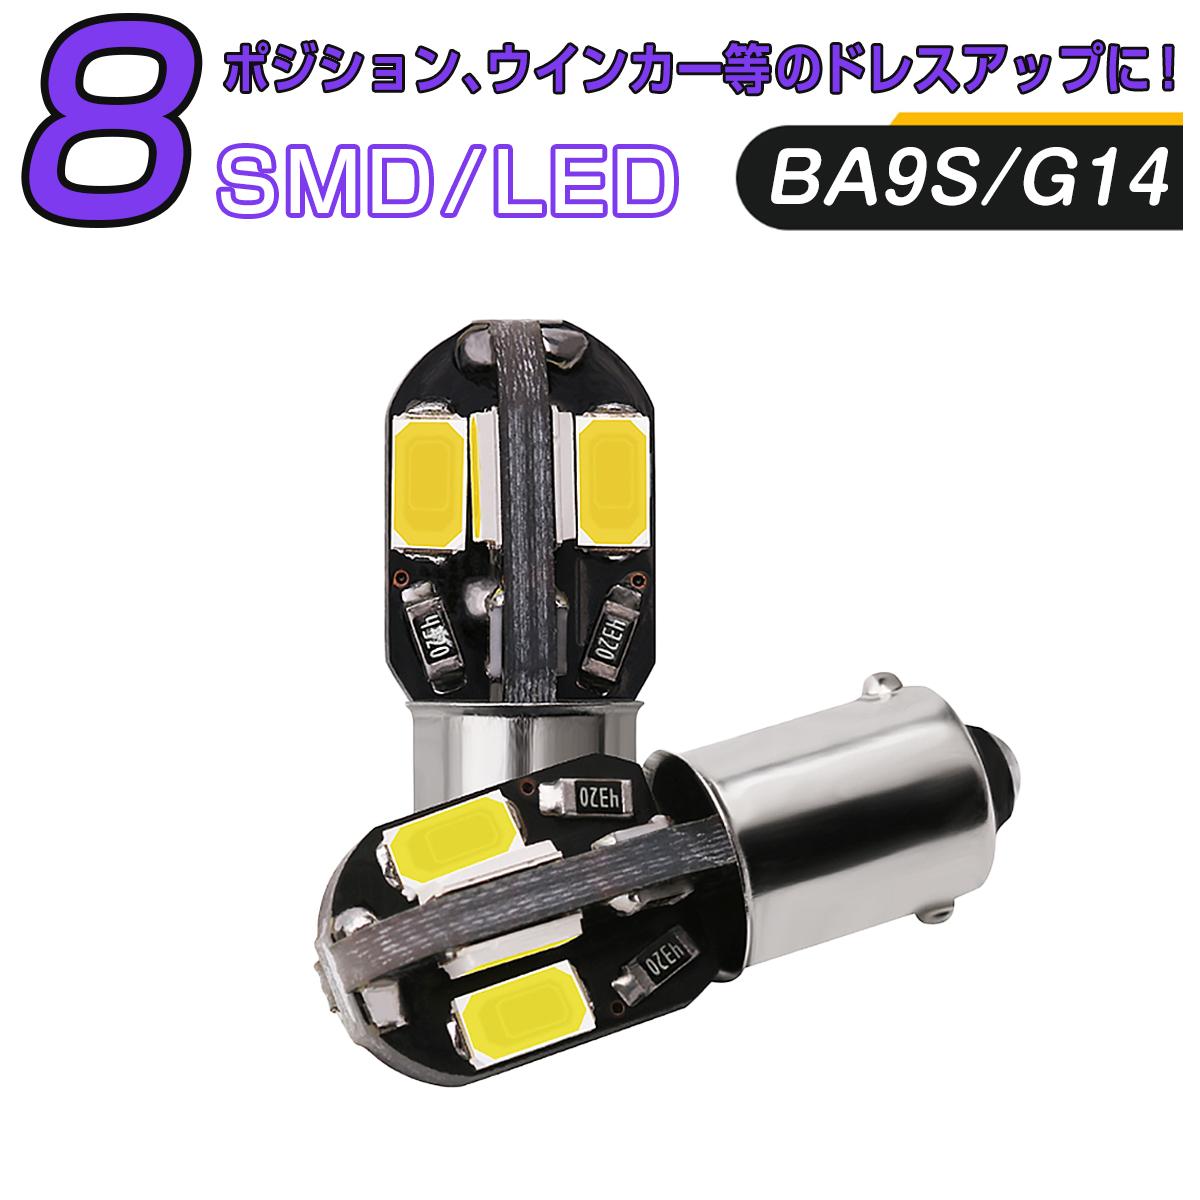 BA9S G14 8連 Samsung サムスン 5630 SMD 白 黄 LEDキャンセラー内蔵 2個セット 360度無死角 12V 5W仕様 Canbus 球切れ警告灯キャンセラー内蔵 SDM便送料無料 1ヶ月保証